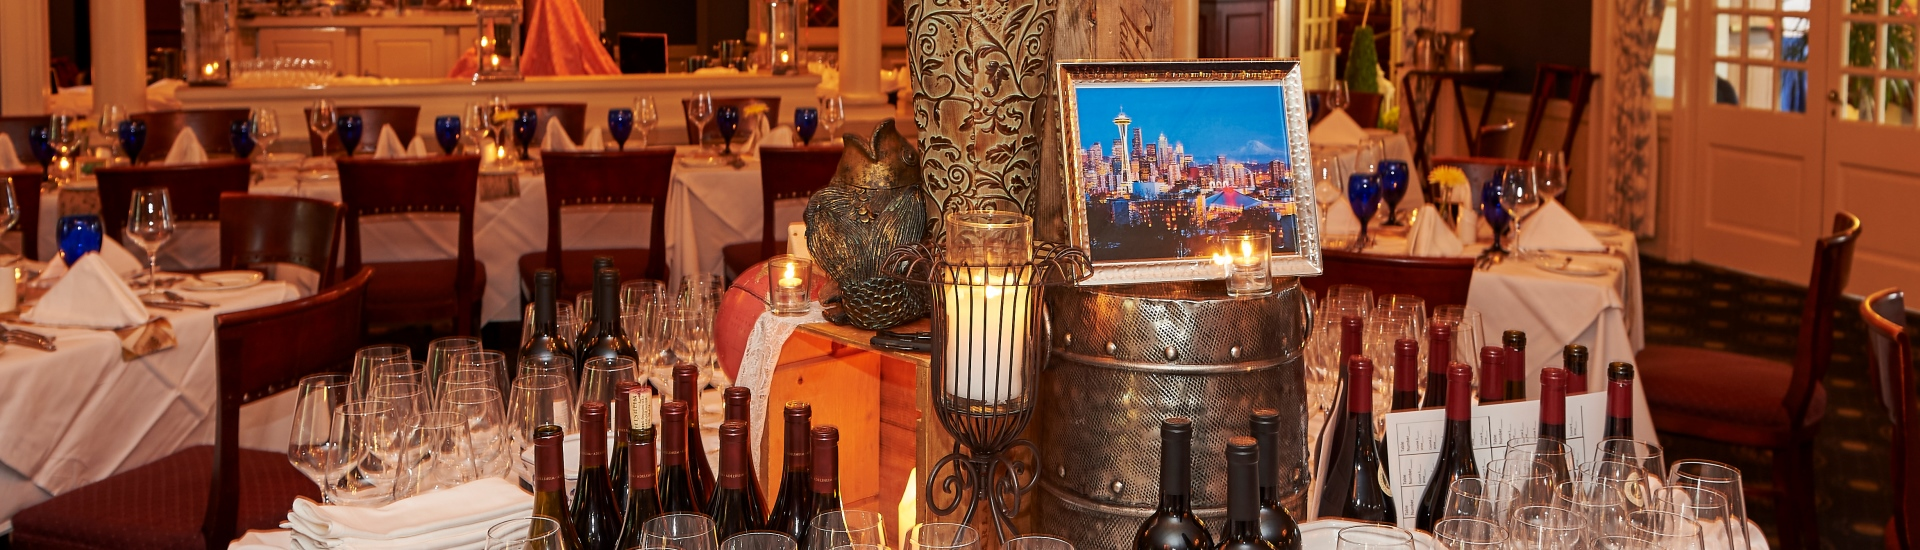 Wine Dinner tables